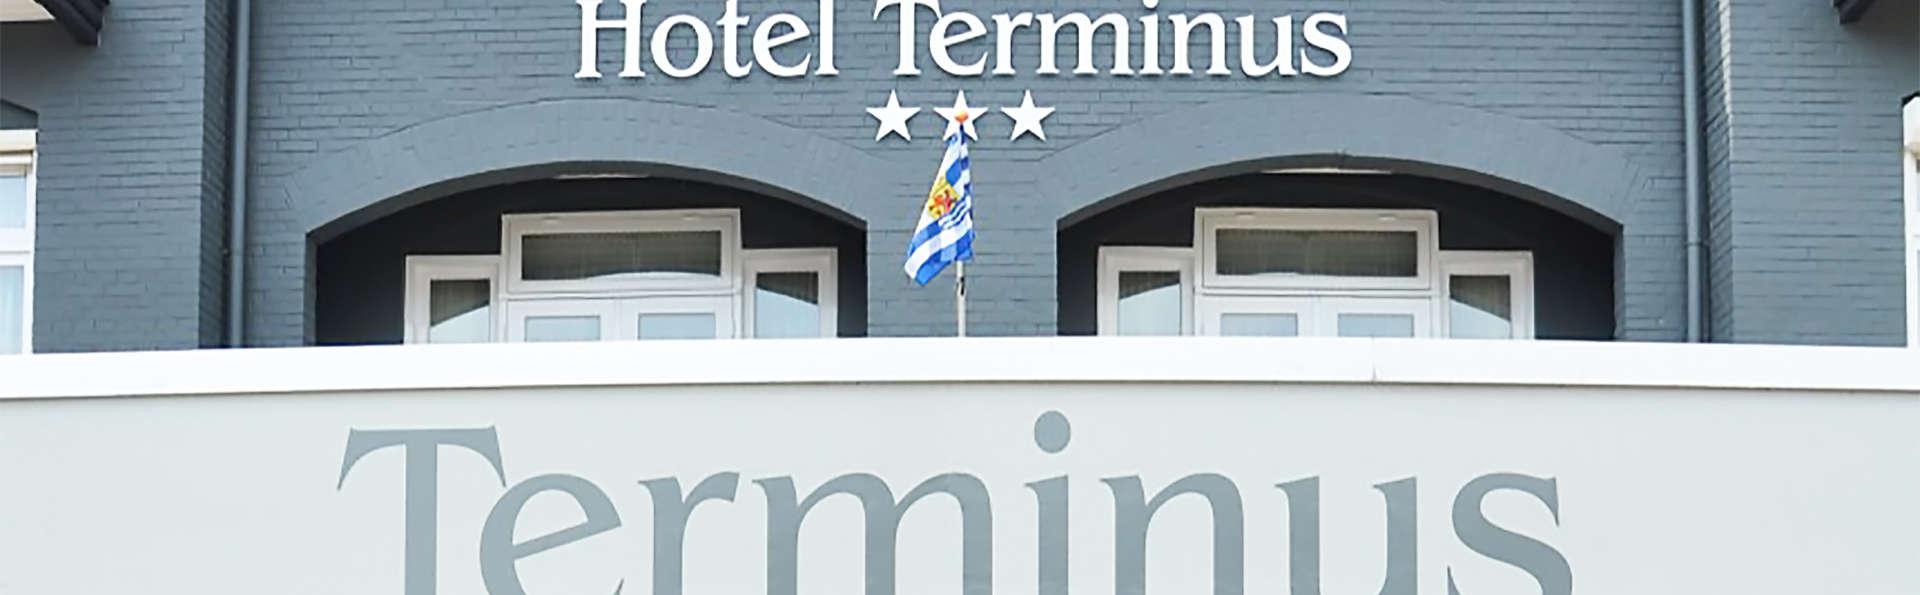 Hotel Terminus - EDIT_front2.jpg